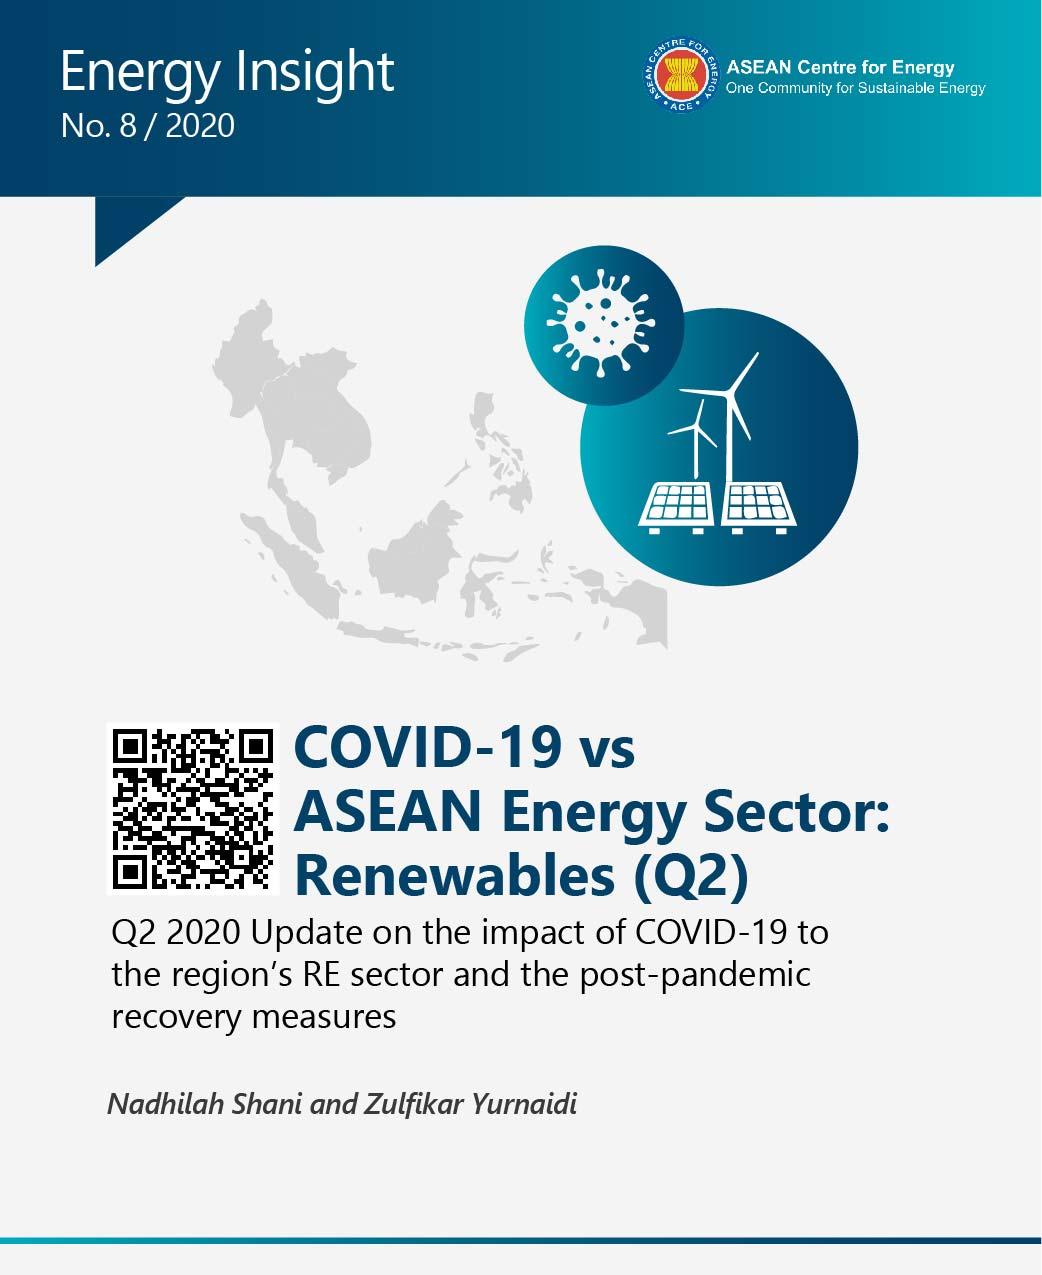 COVID19 vs Renewables